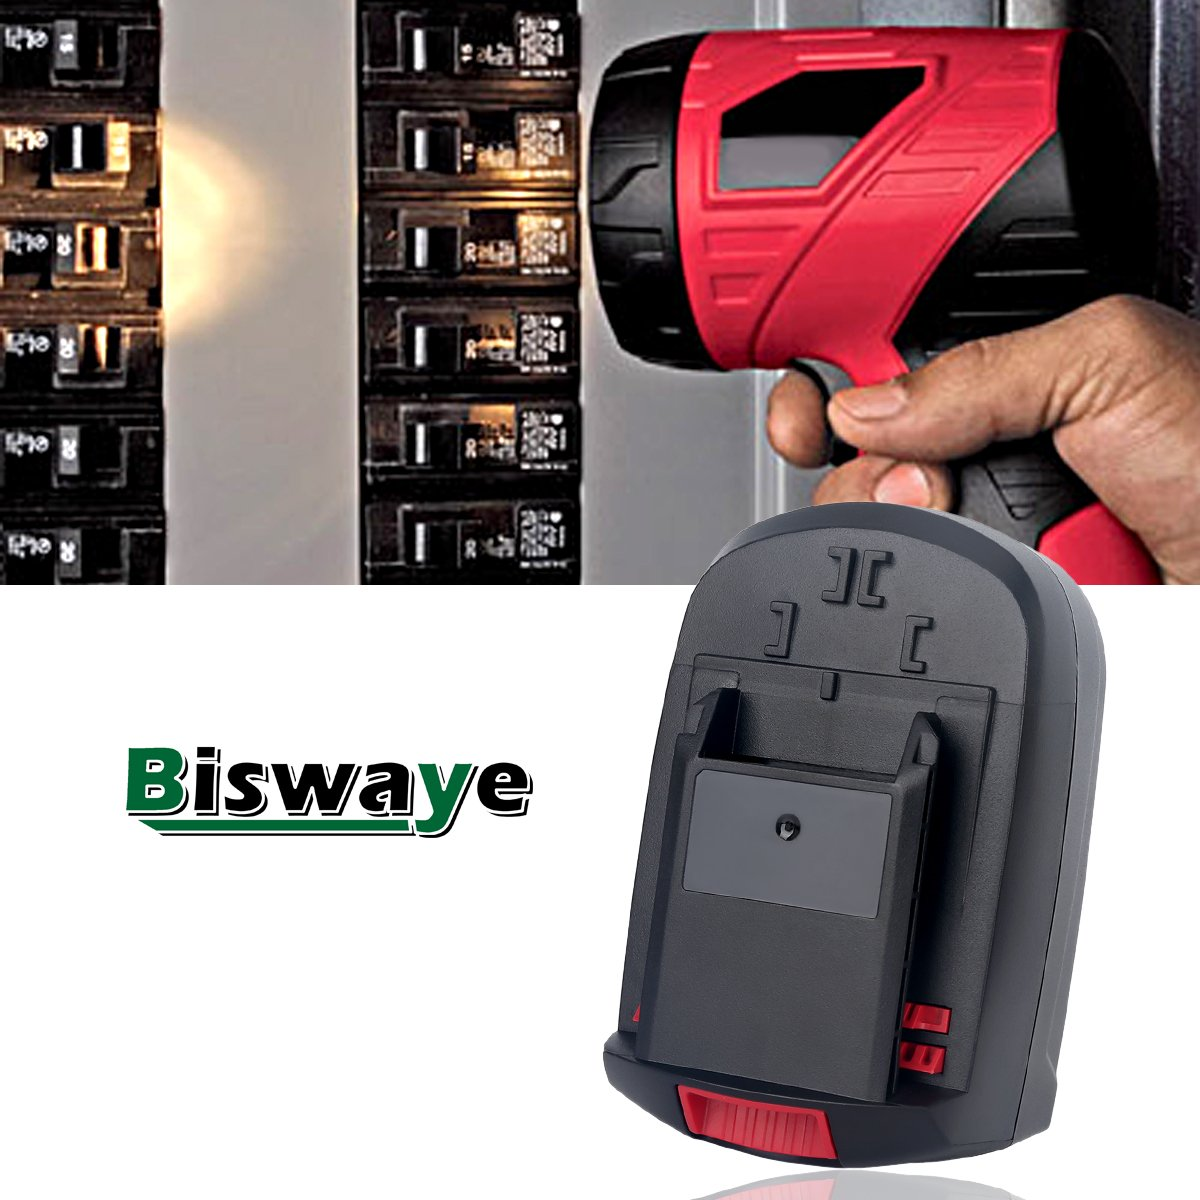 Biswaye 2Pack 18V Battery SB18C SB18A SB18B for Skil 18V Select System Cordless Tools 2810 2888 2895 2897 2898 4570 5850 5995 7305 9350, 3000mAh Ni-Cd by Biswaye (Image #7)